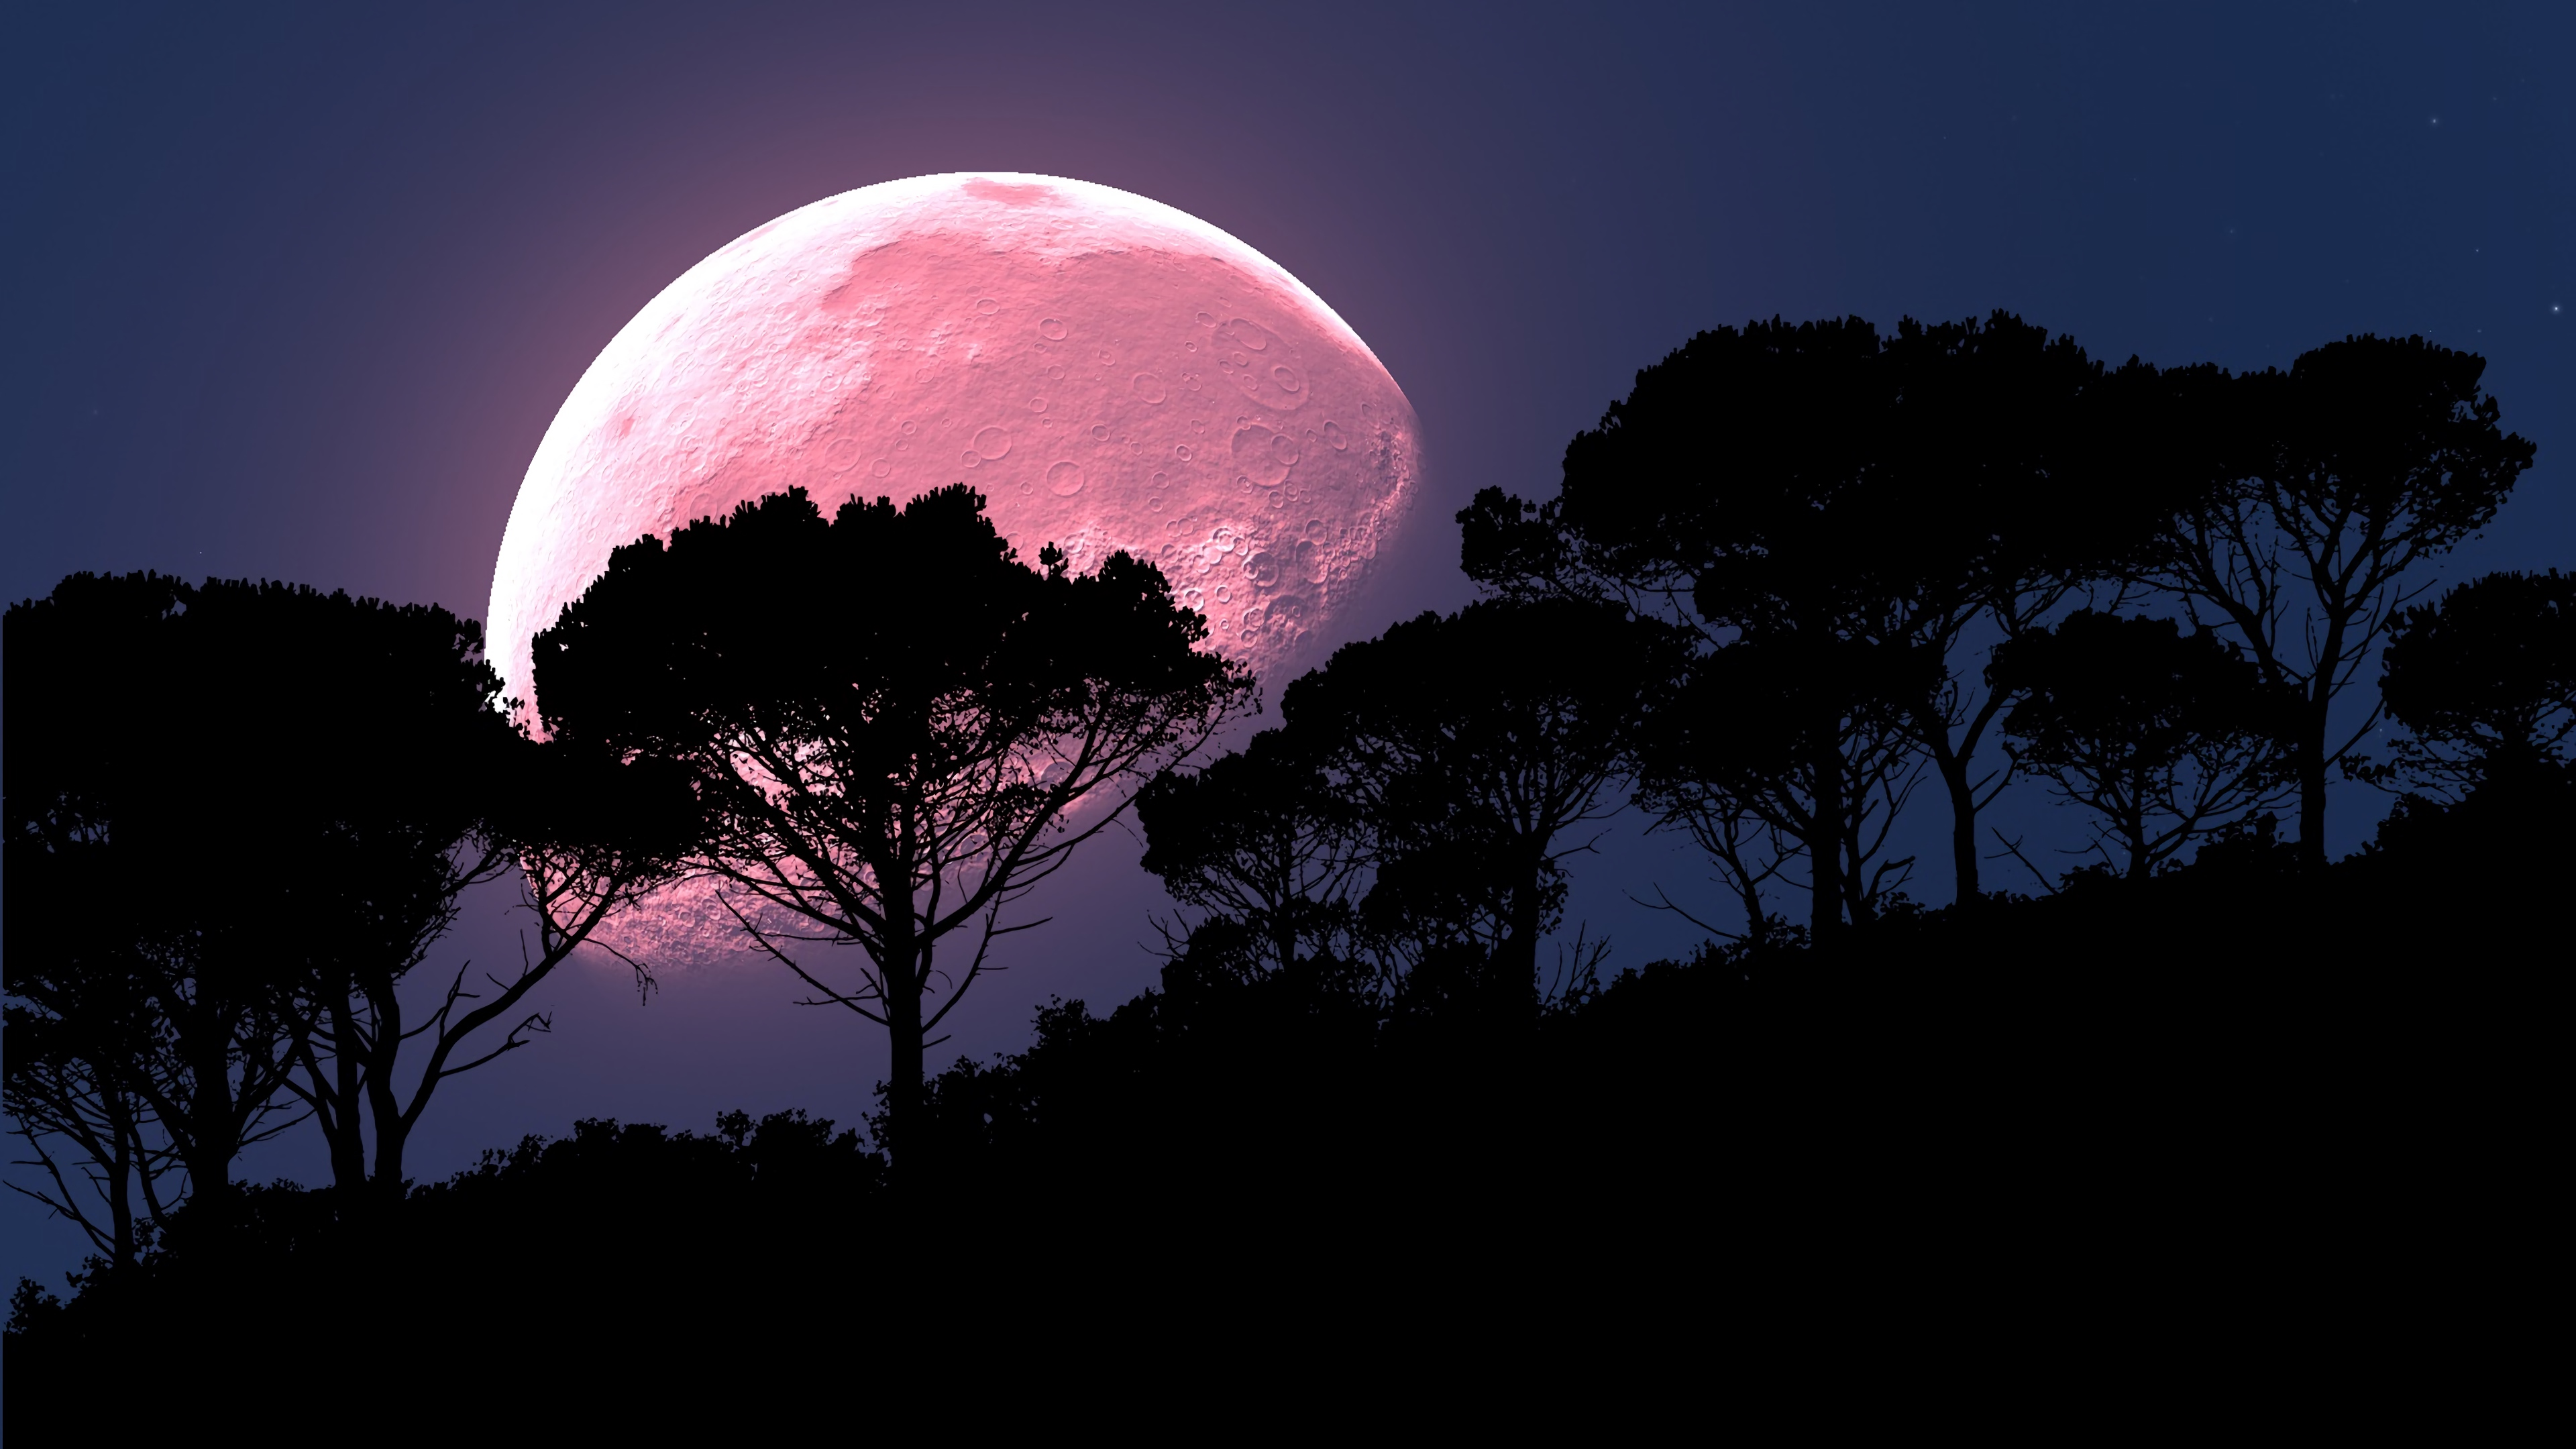 moon tree photoshop night full moon planet 4k 1540576010 - moon, tree, photoshop, night, full moon, planet 4k - tree, photoshop, Moon